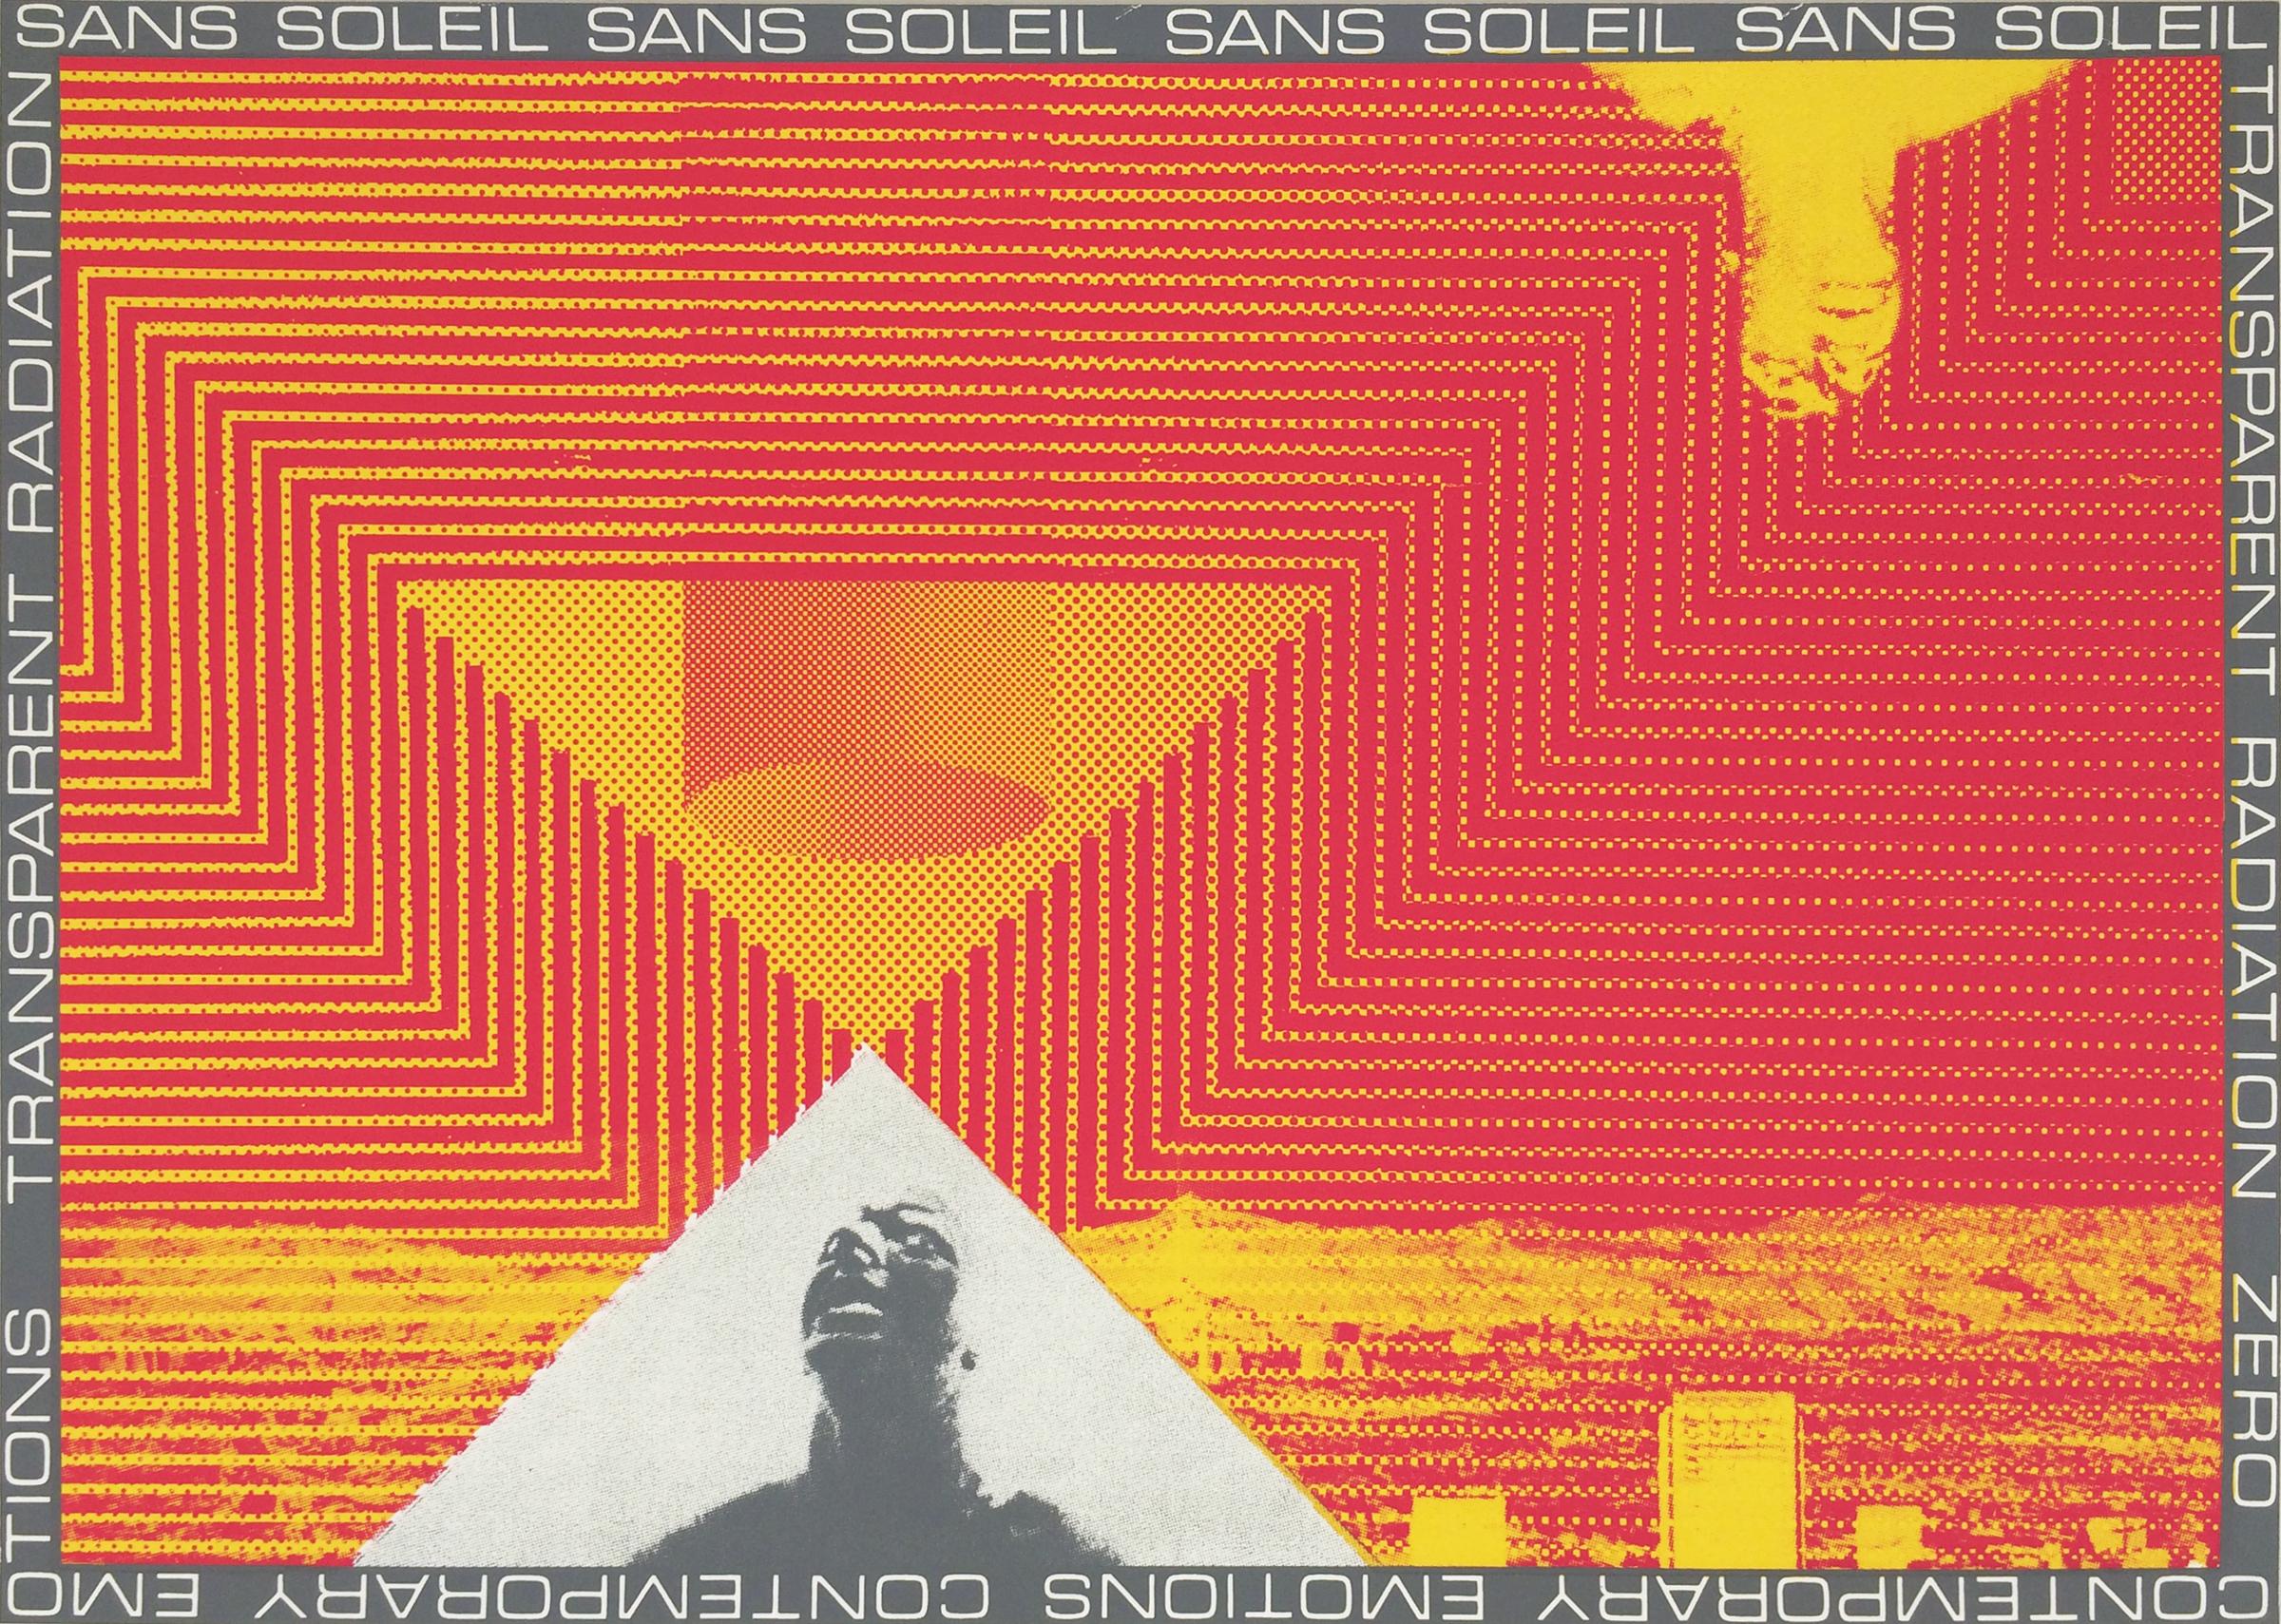 "GWENAËL RATTKE   Sans Soleil , unique silkscreen on paper (1 of 1), 22.5"" x 30.25"", 2015"